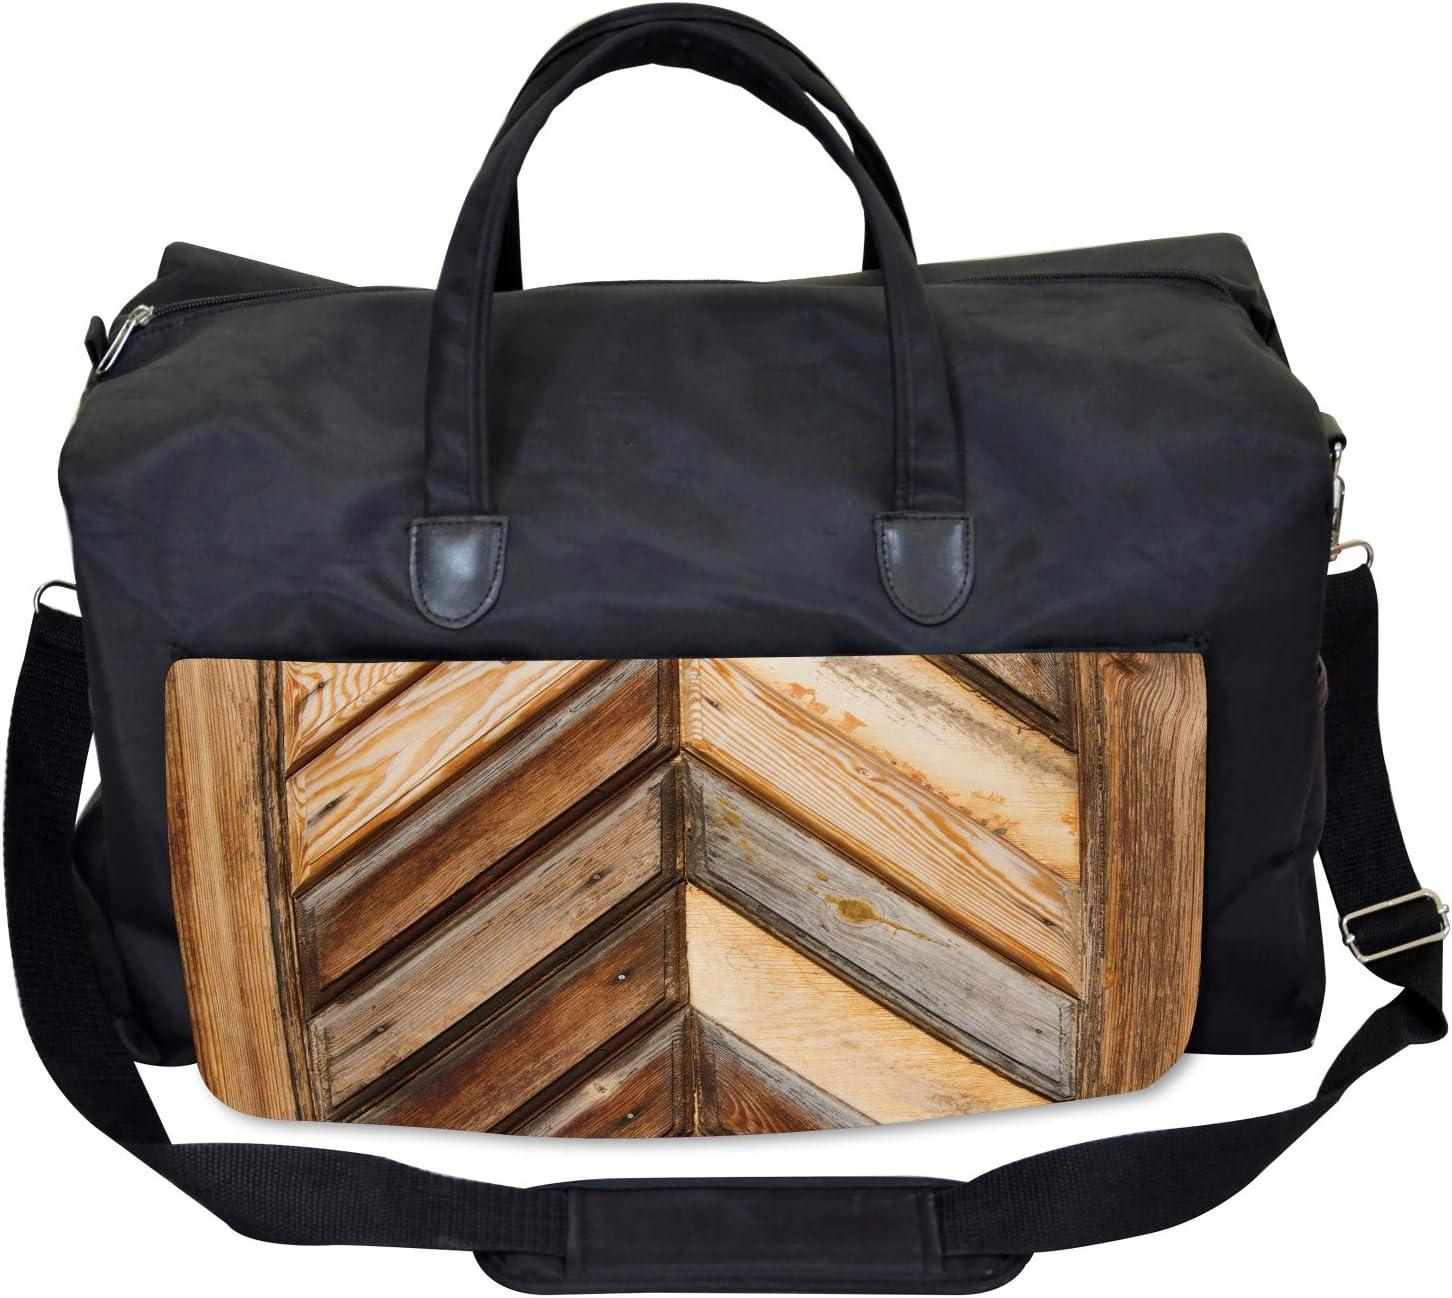 Grunge Nature Gardening Ambesonne Vintage Gym Bag Large Weekender Carry-on